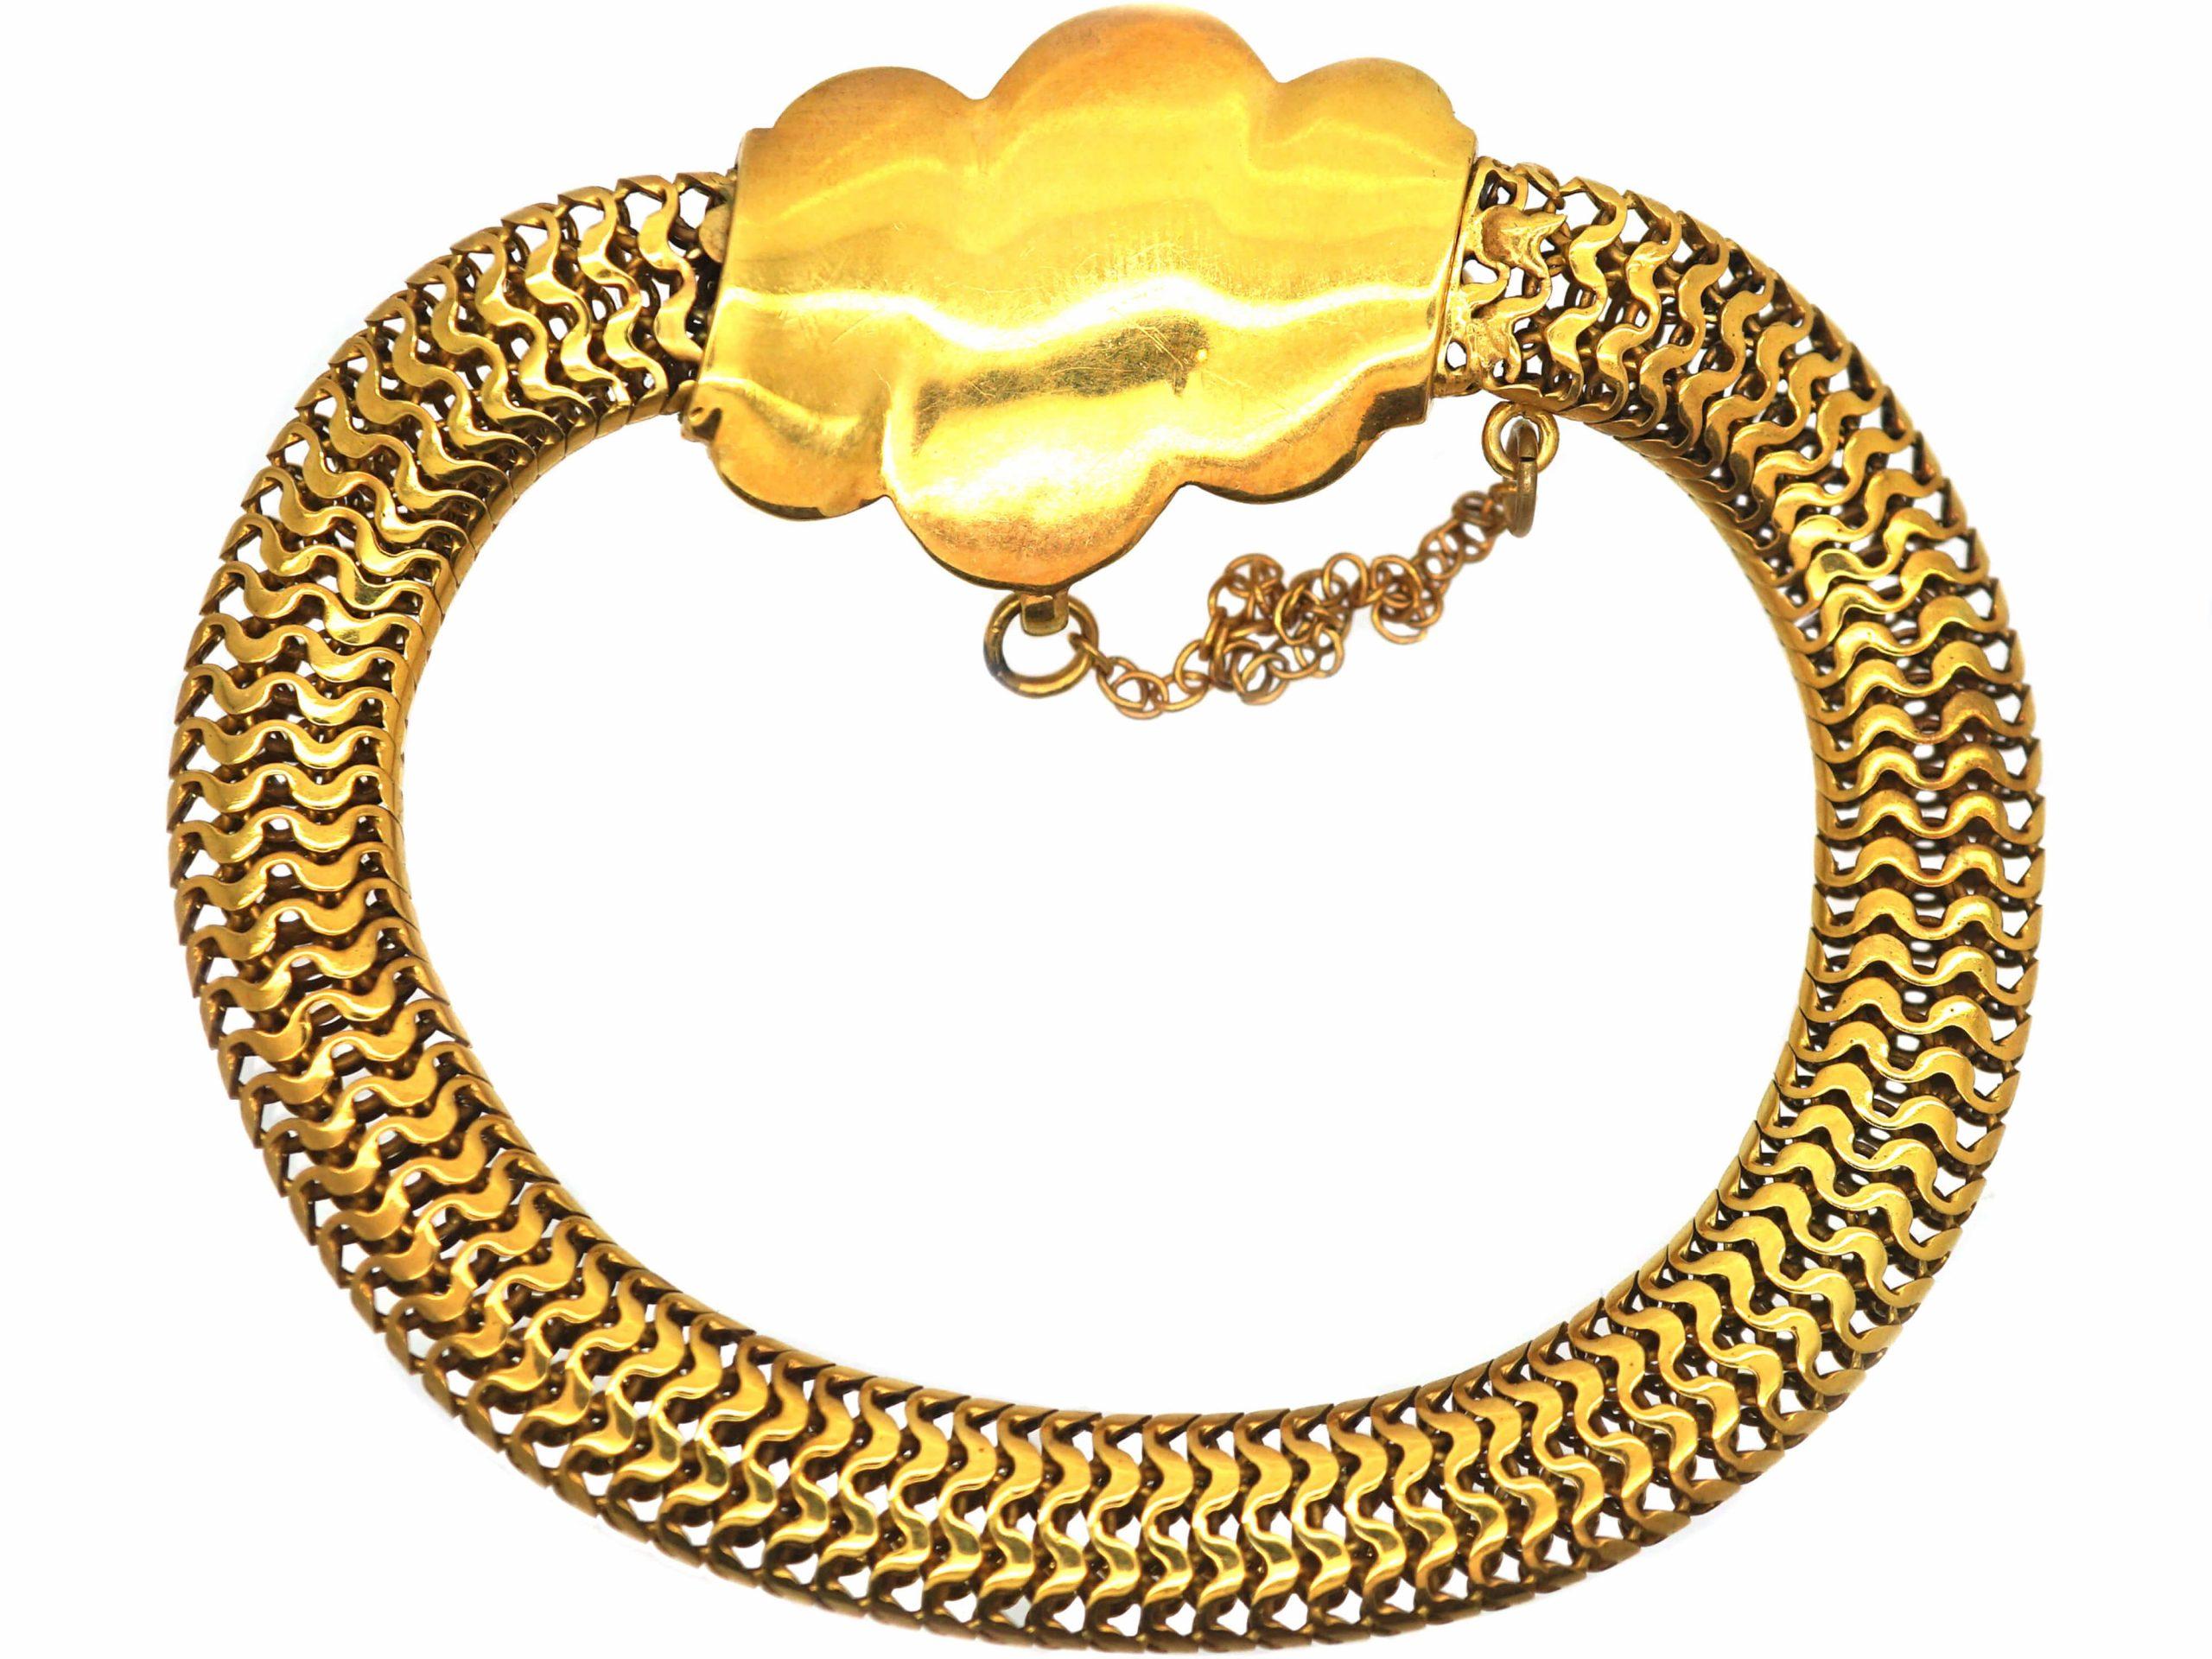 Victorian 15ct Gold with Triple Coil Motif Bracelet